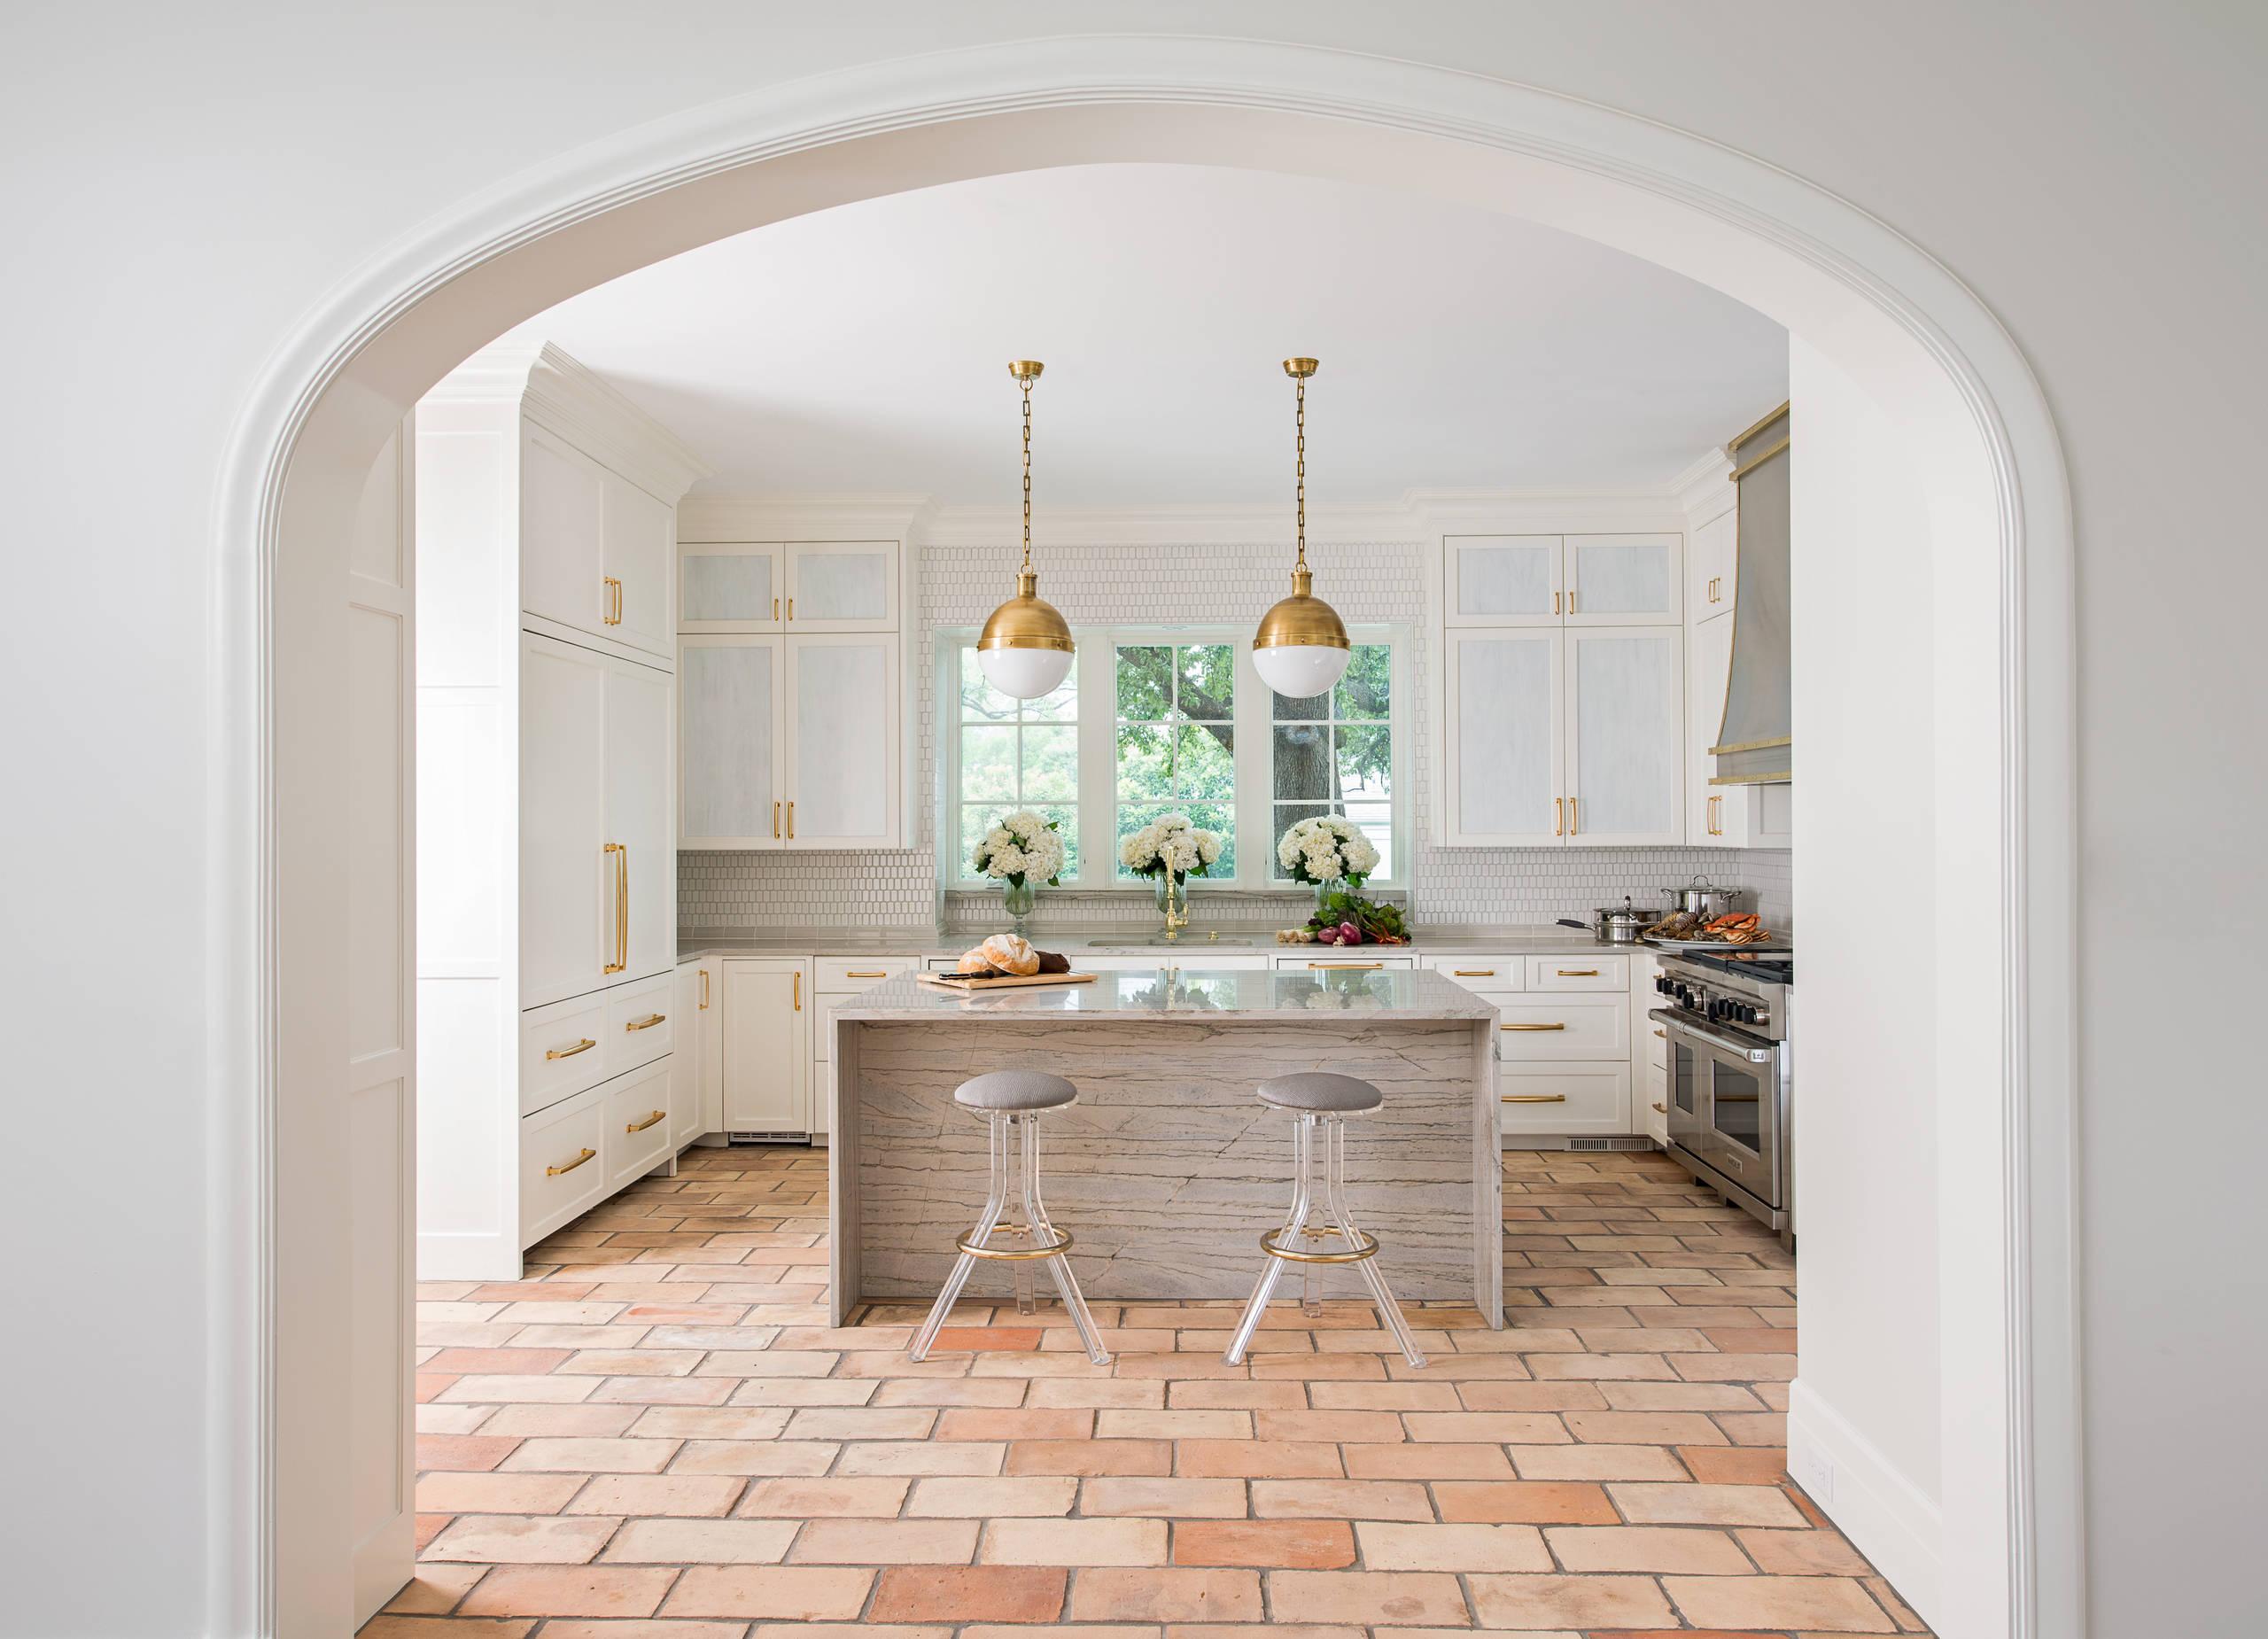 Terra Cotta Tile Backsplash Material Kitchen Ideas Photos Houzz